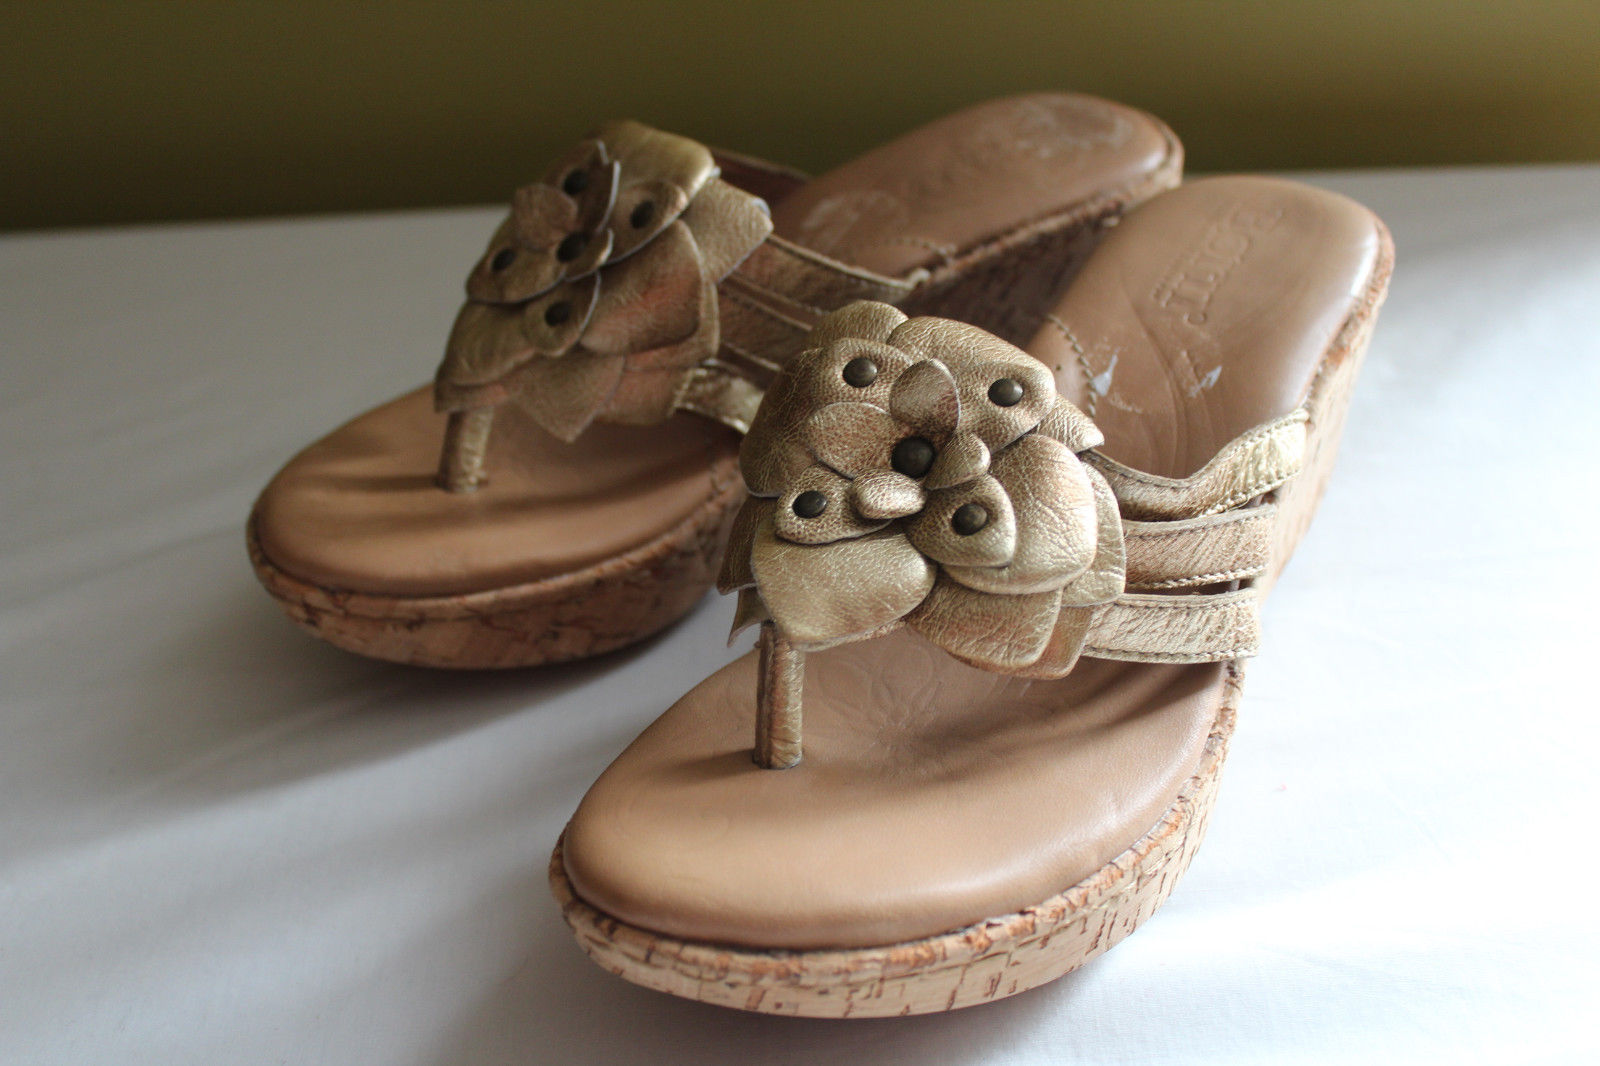 c6361149726a Born Crown Leather Gold Metallic MIA 1 Cork Wedge Sandals 6 36.5  105